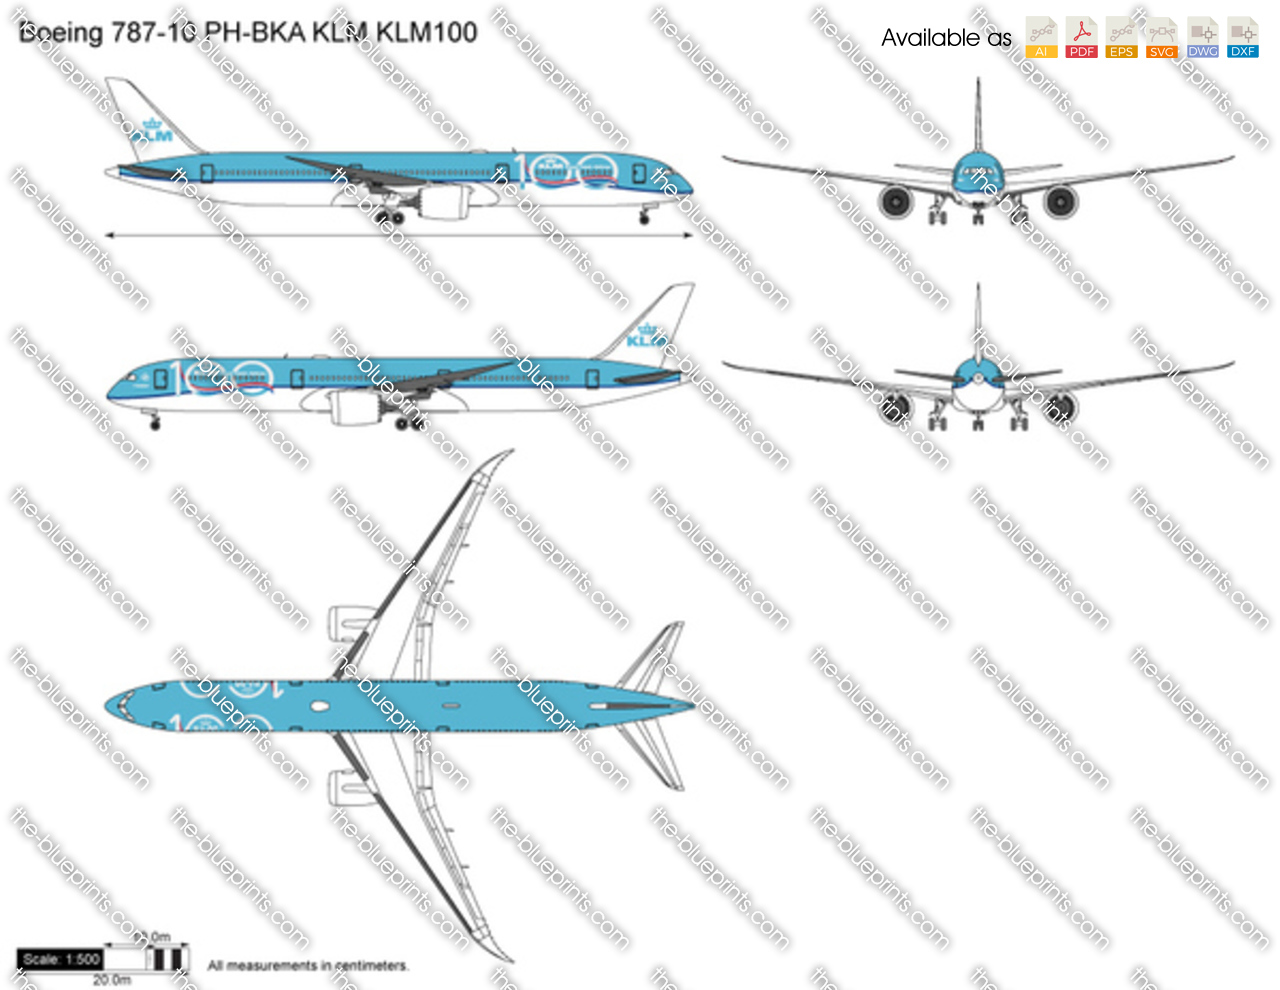 Boeing 787-10 PH-BKA KLM KLM100